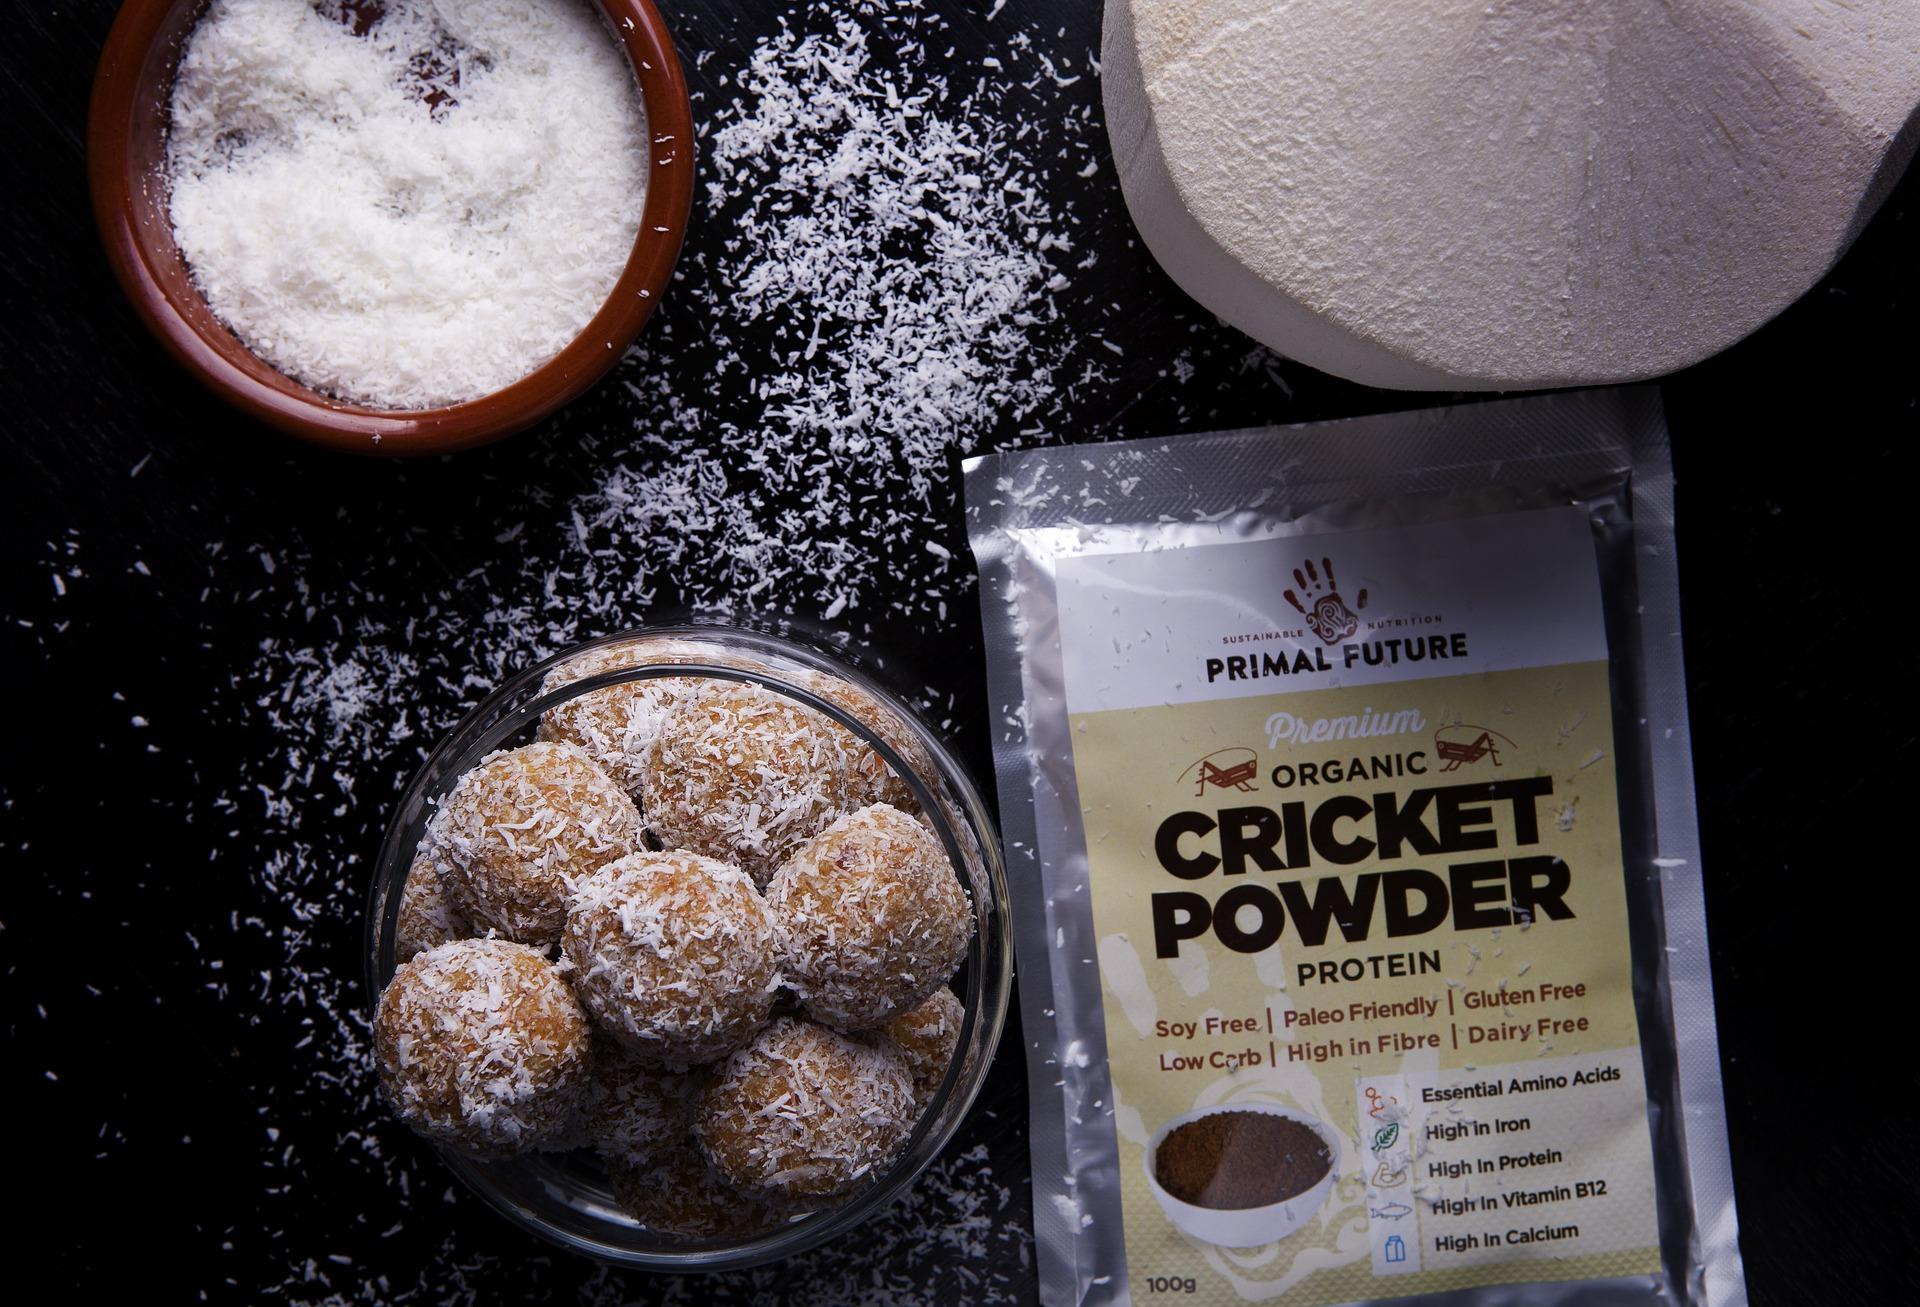 cricket powder.jpg